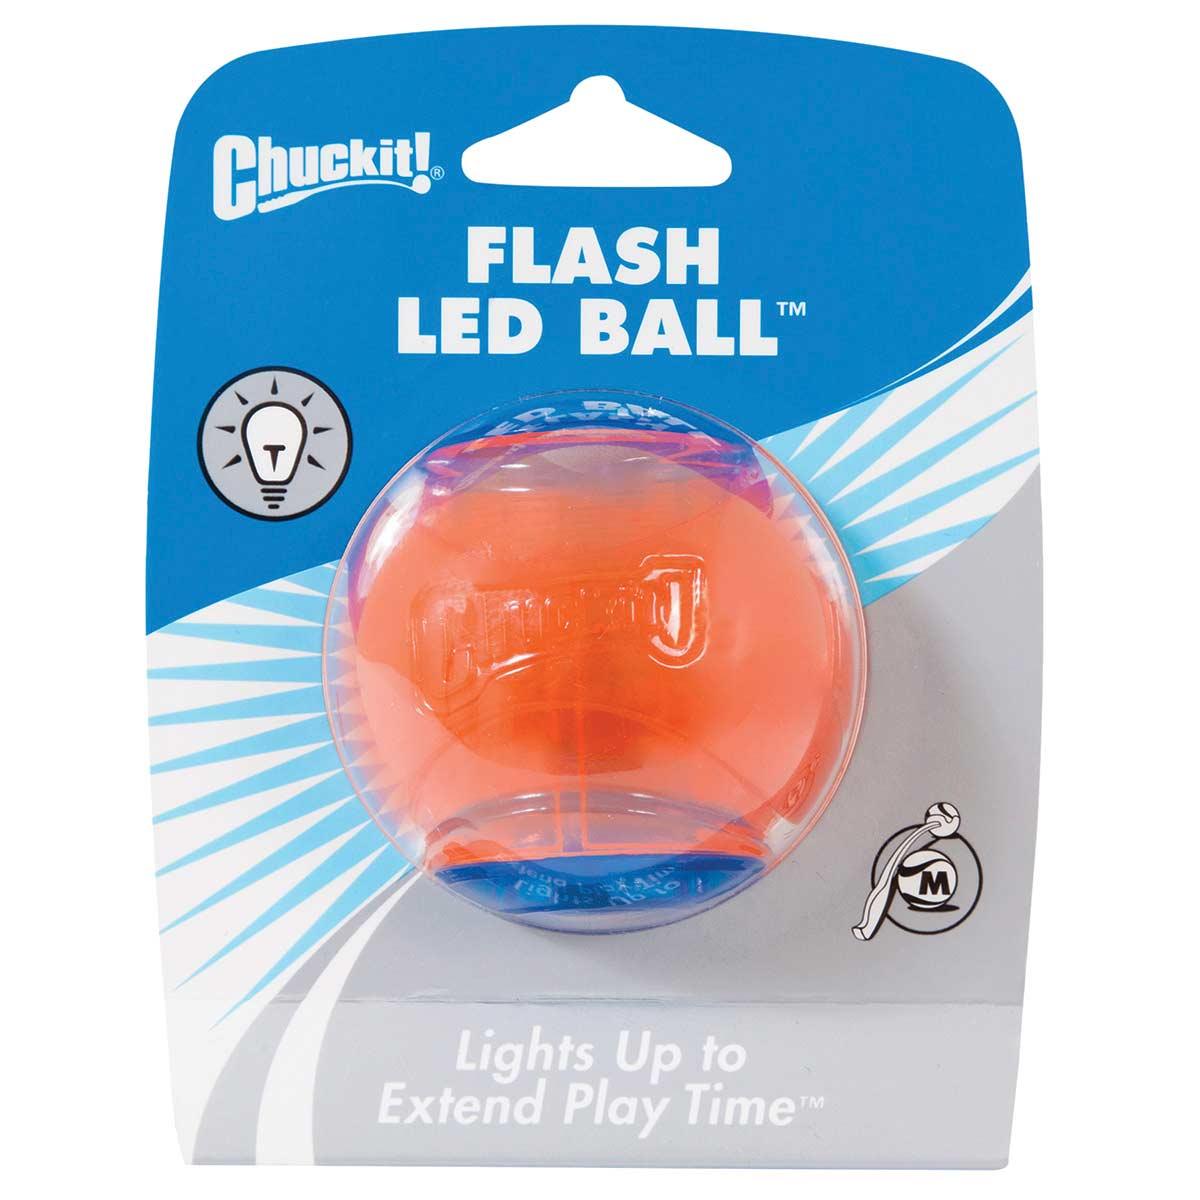 Medium Chuckit! Strobe LED Ball